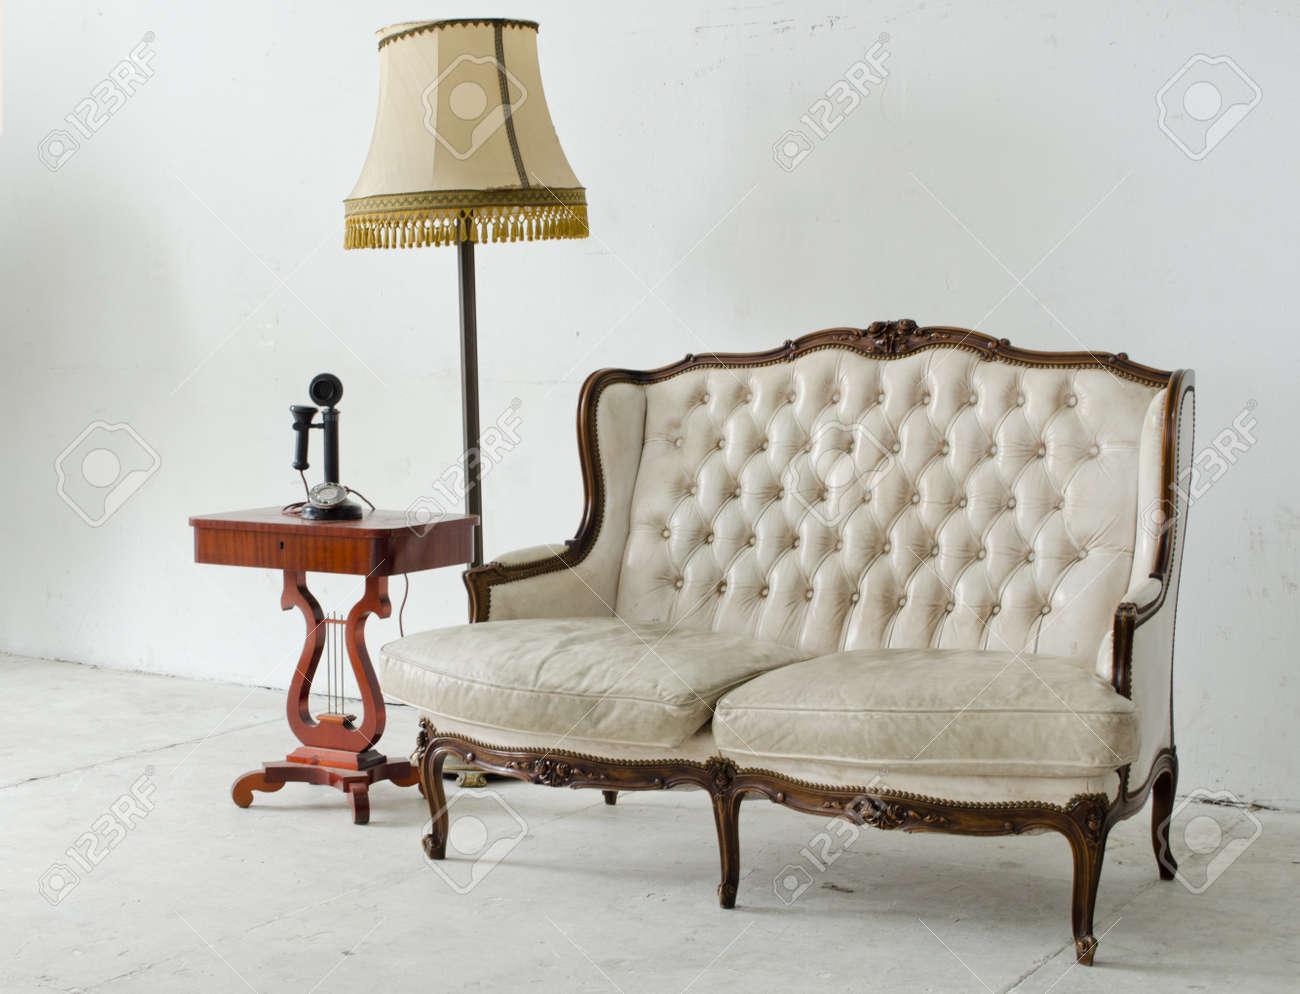 Stock Photo  leather sofa in white room Stock Photo - 13964374